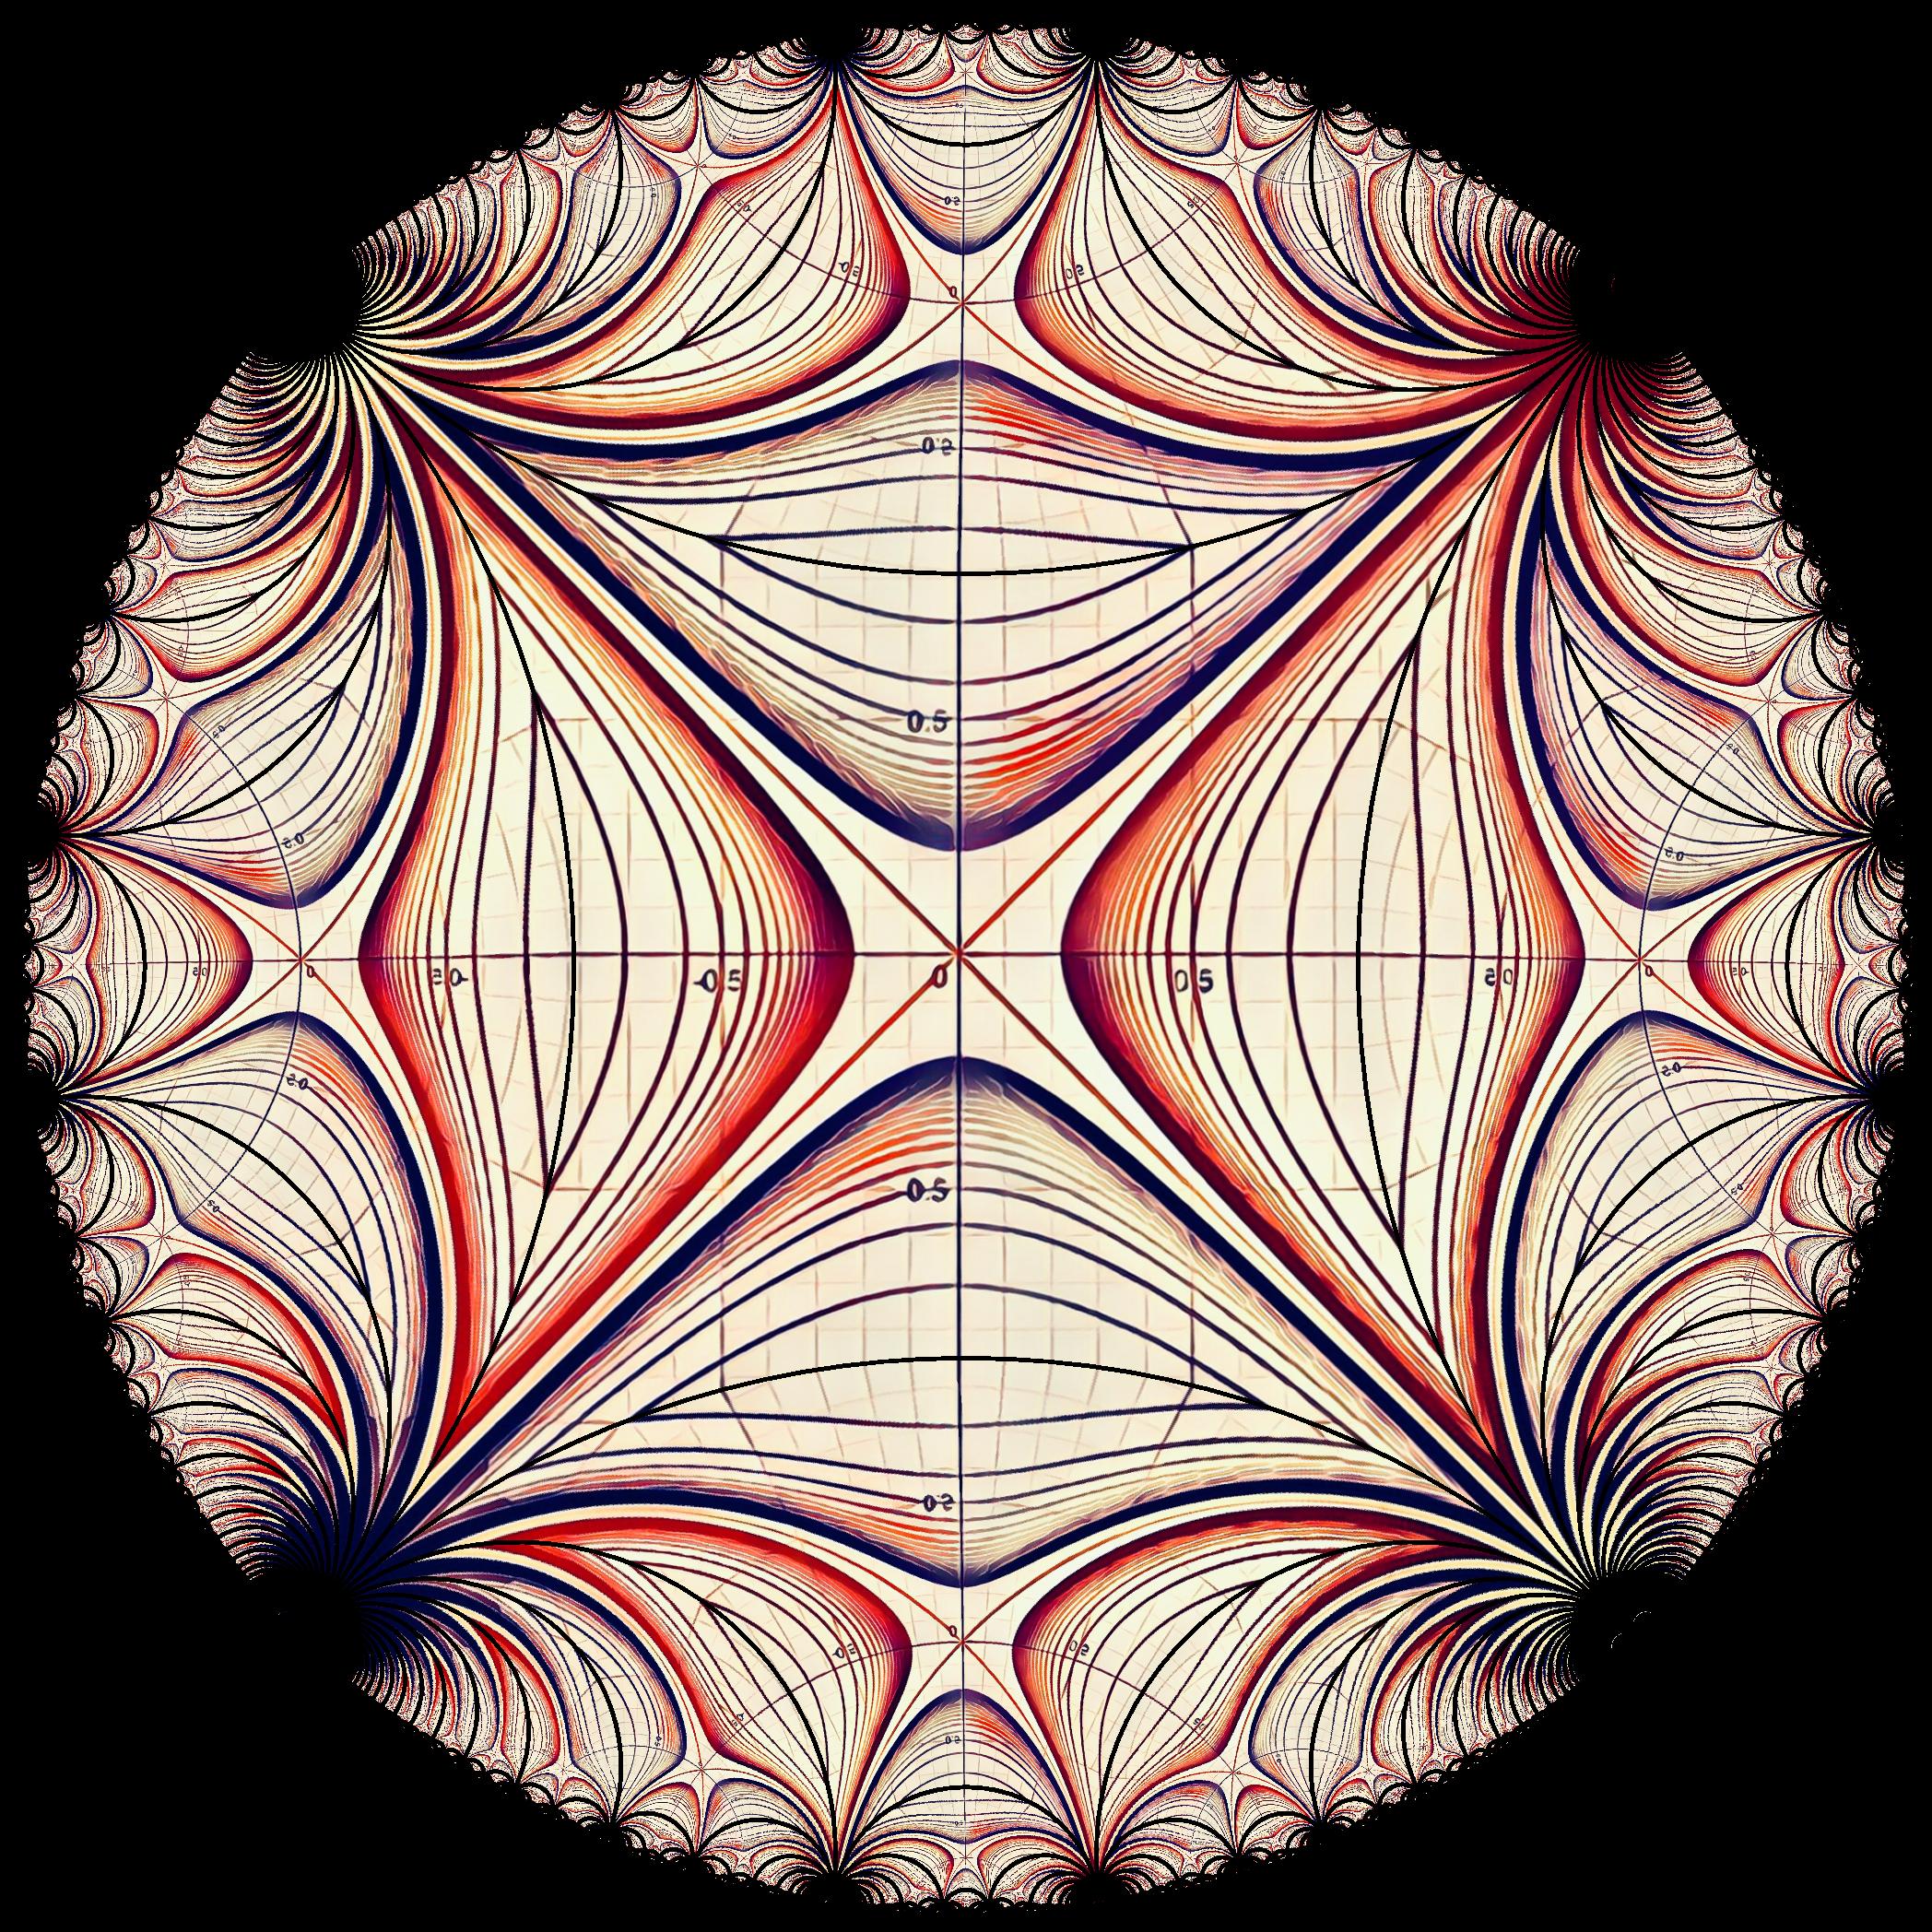 Pin by Philip on Hyperbolic Geometry | Hyperbolic geometry, Geometry, Art